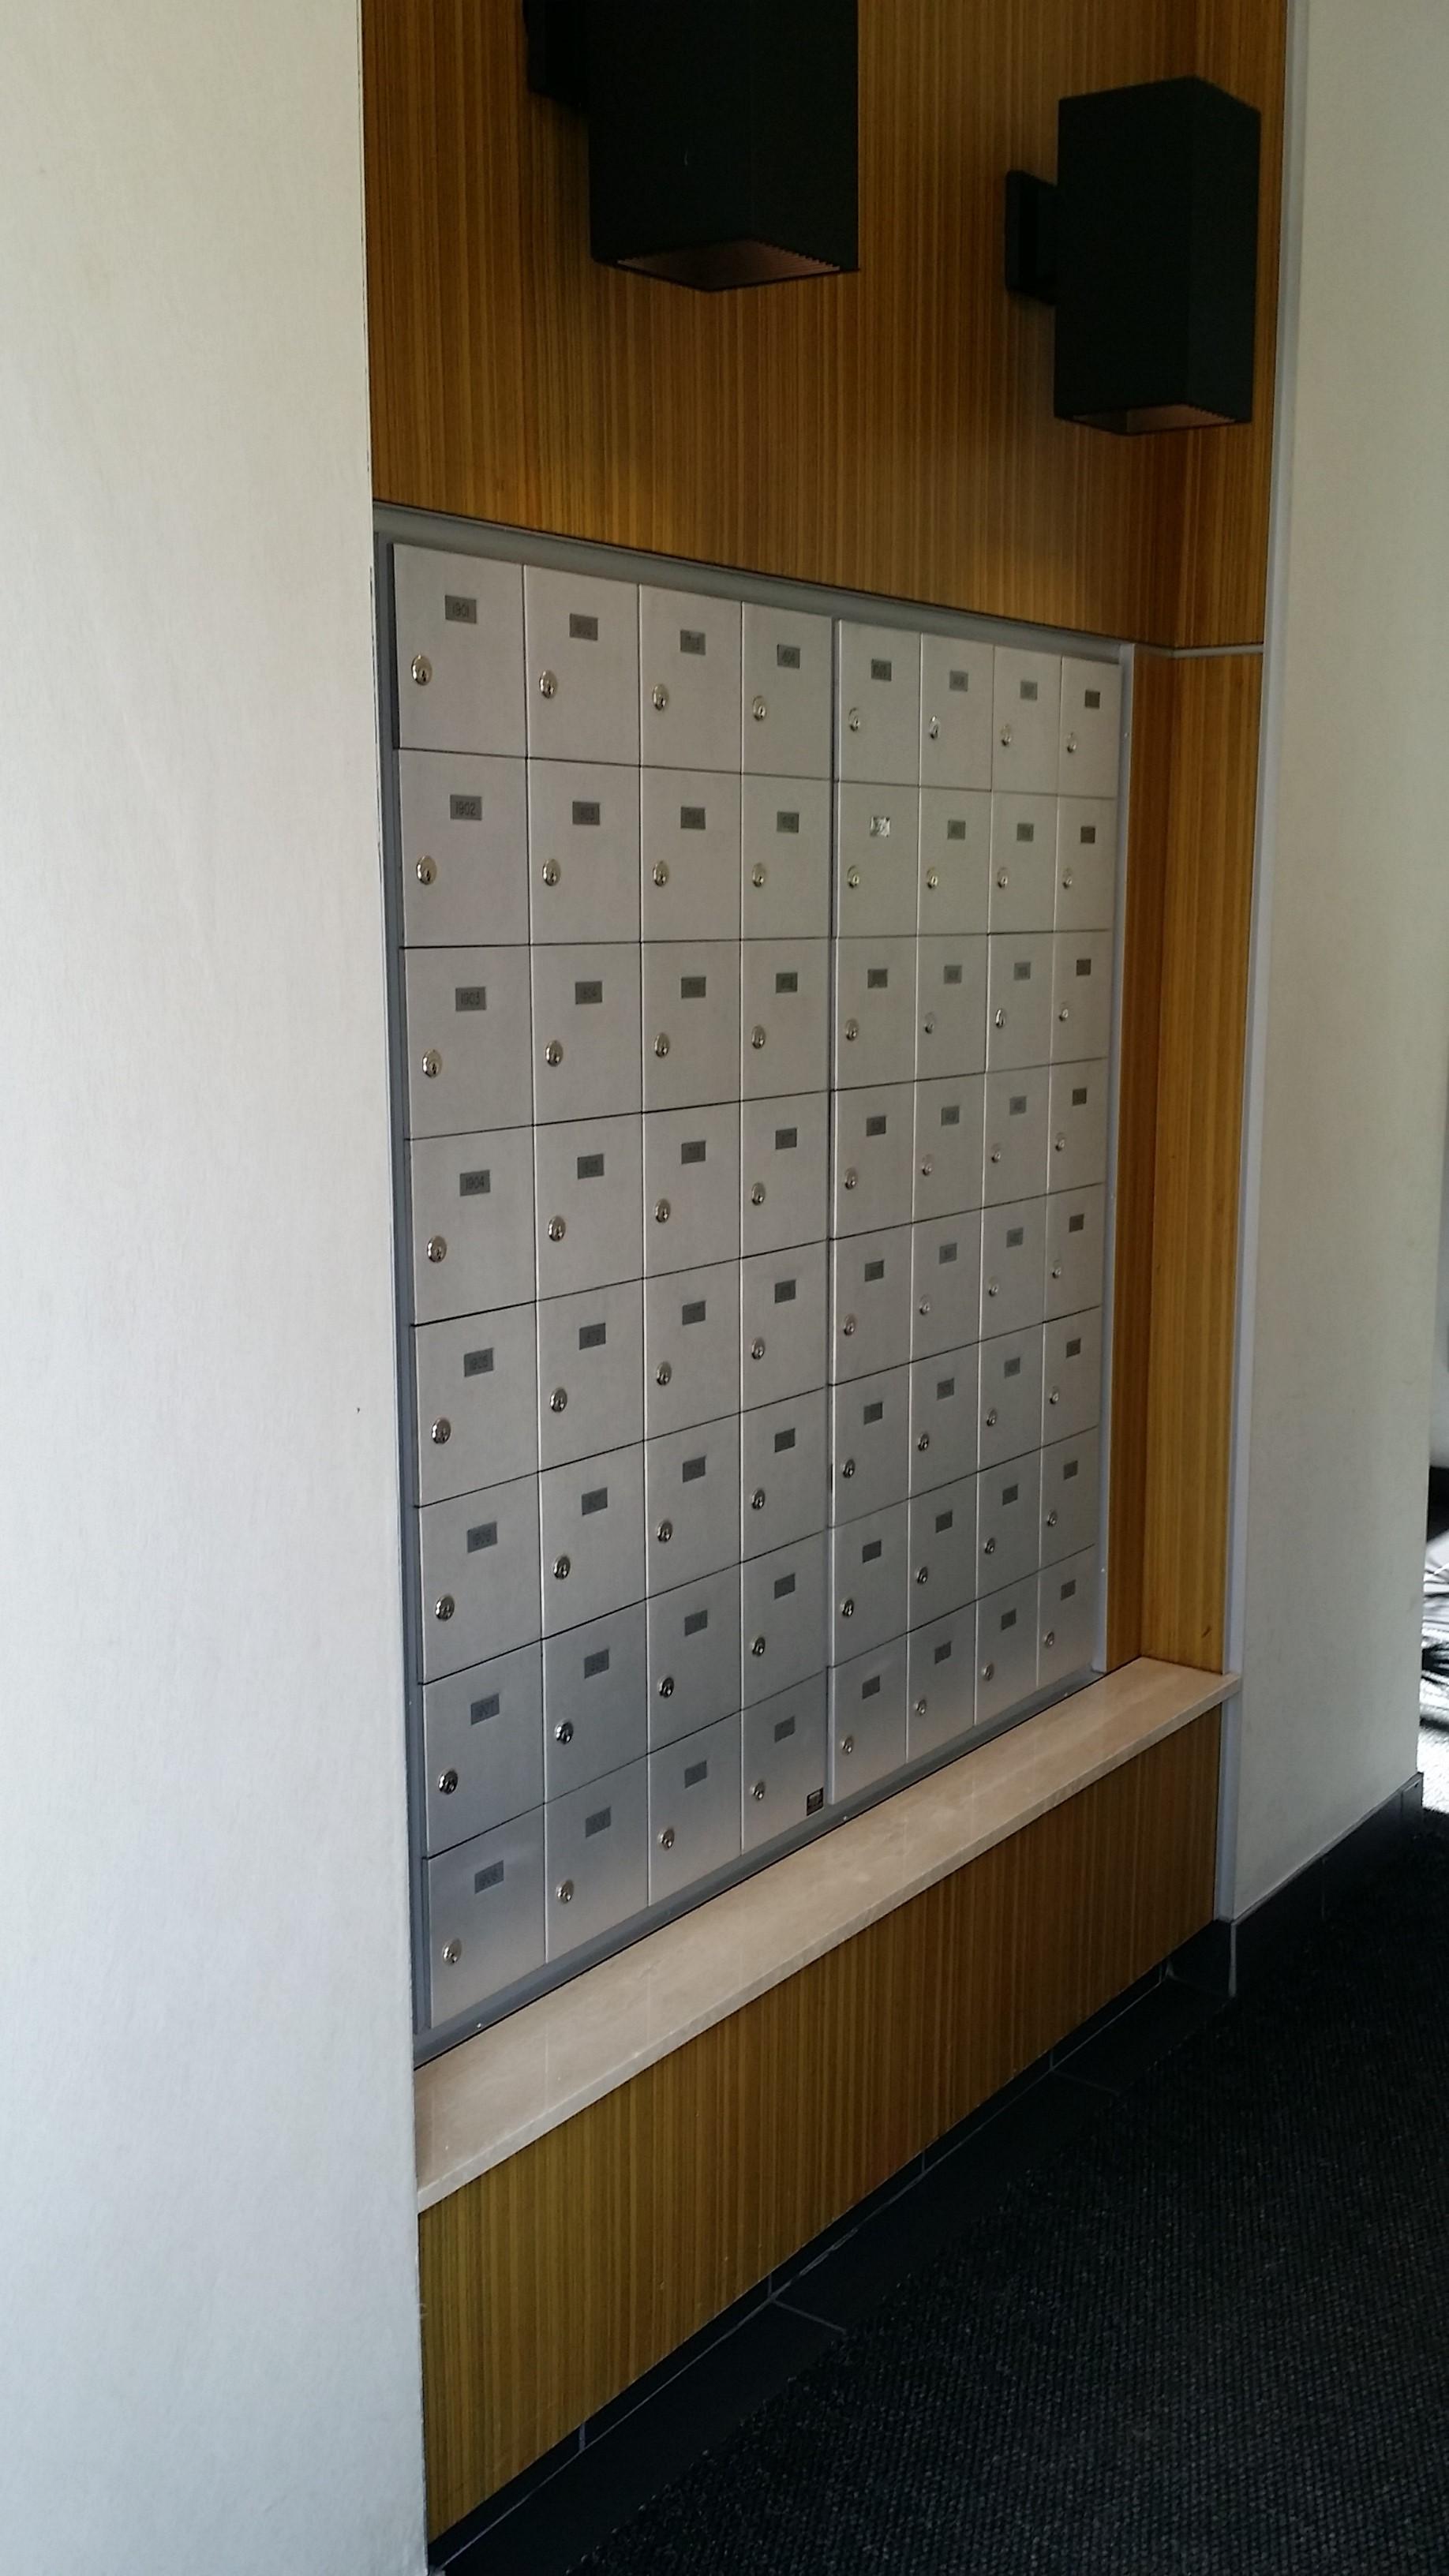 Existing Mailbox Area